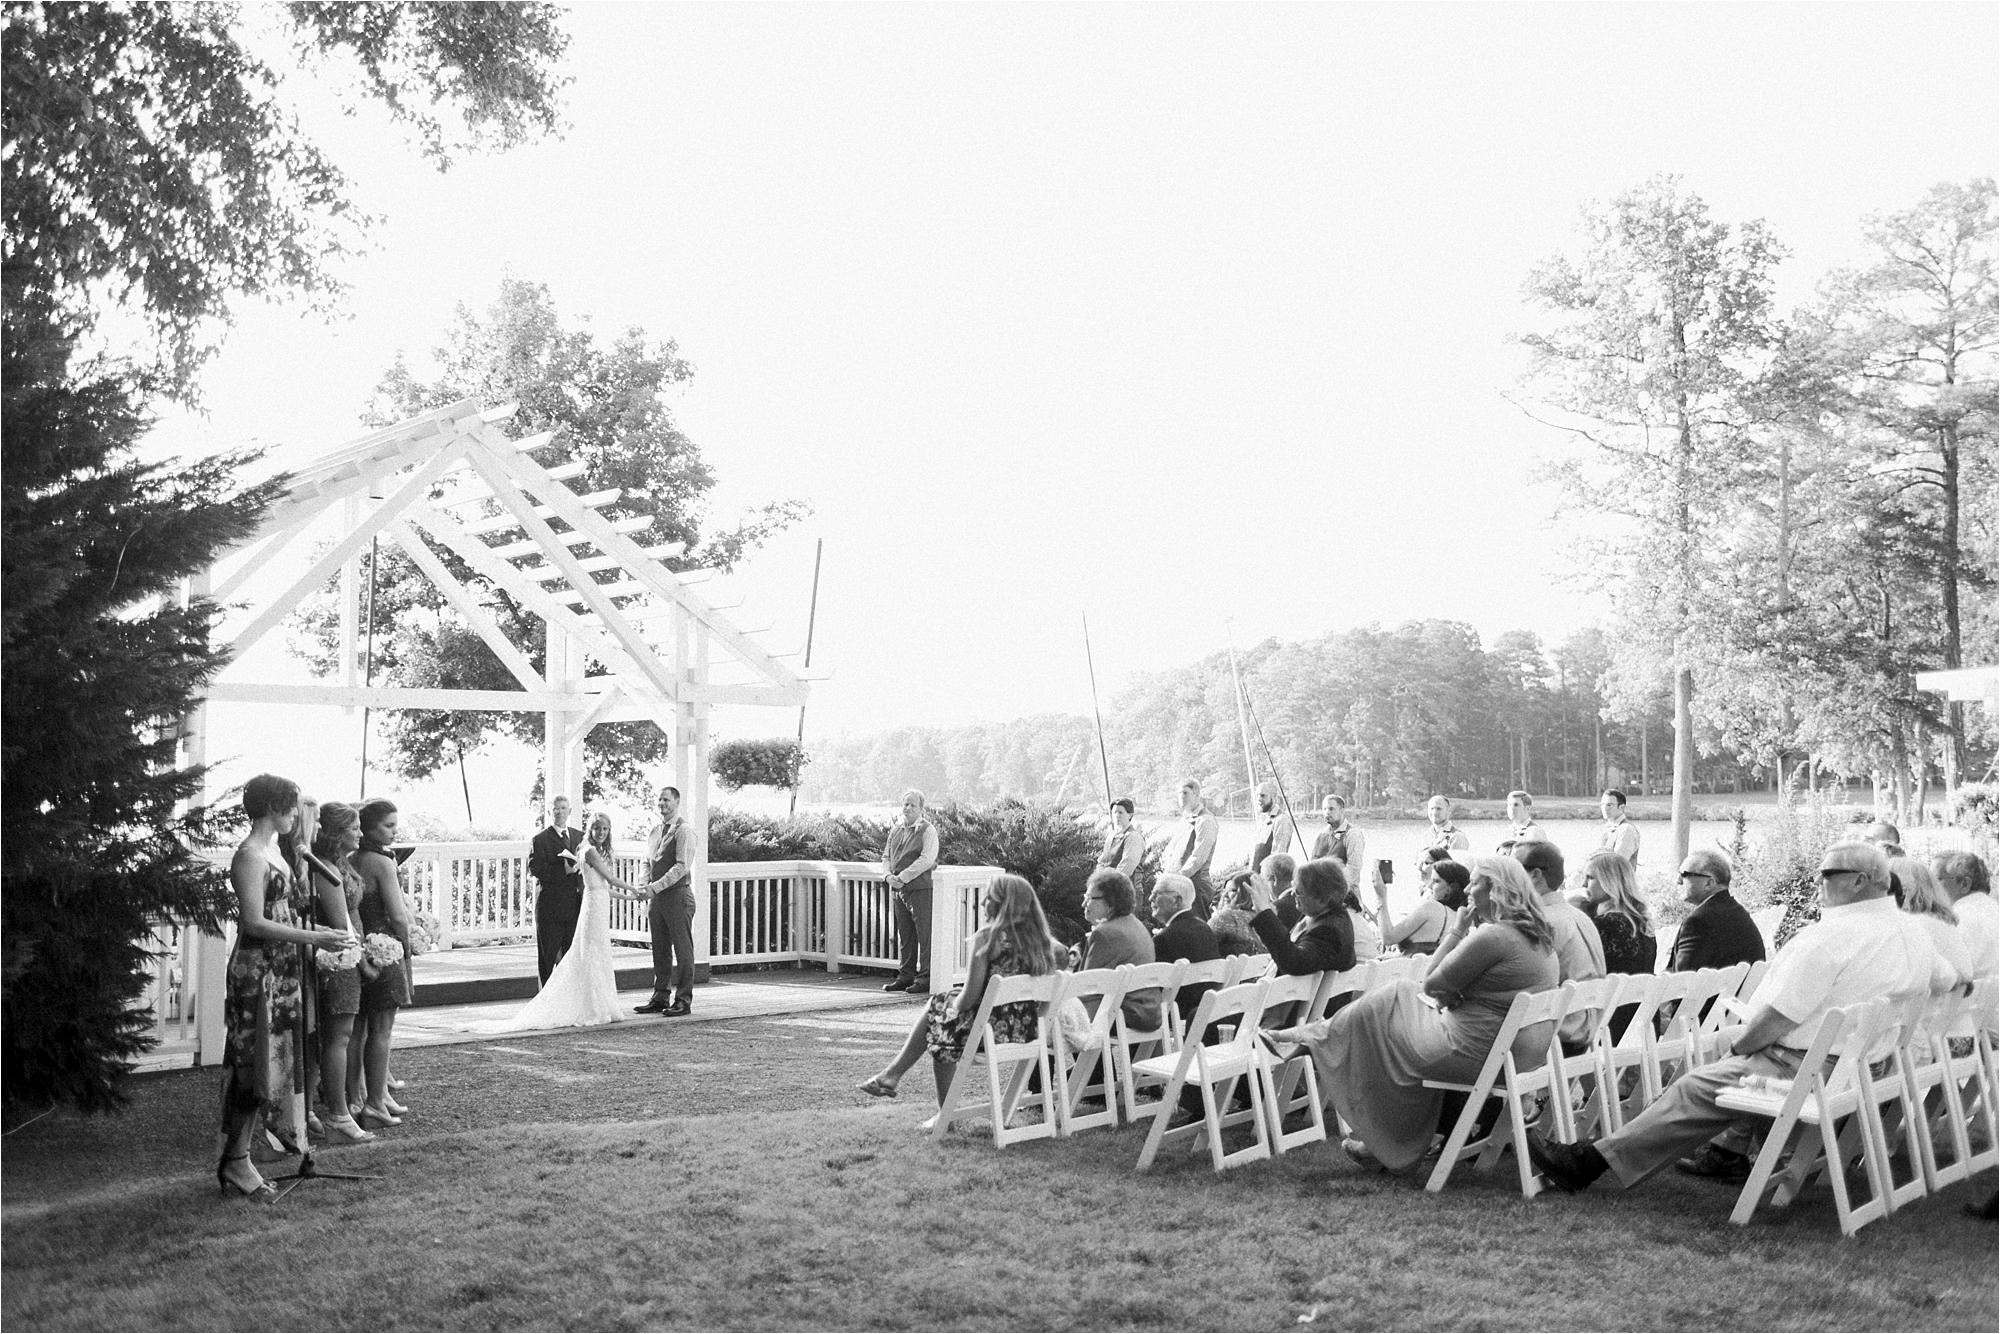 stephanie-yonce-boathouse-sunday-park-virginia-wedding-photo-016.JPG